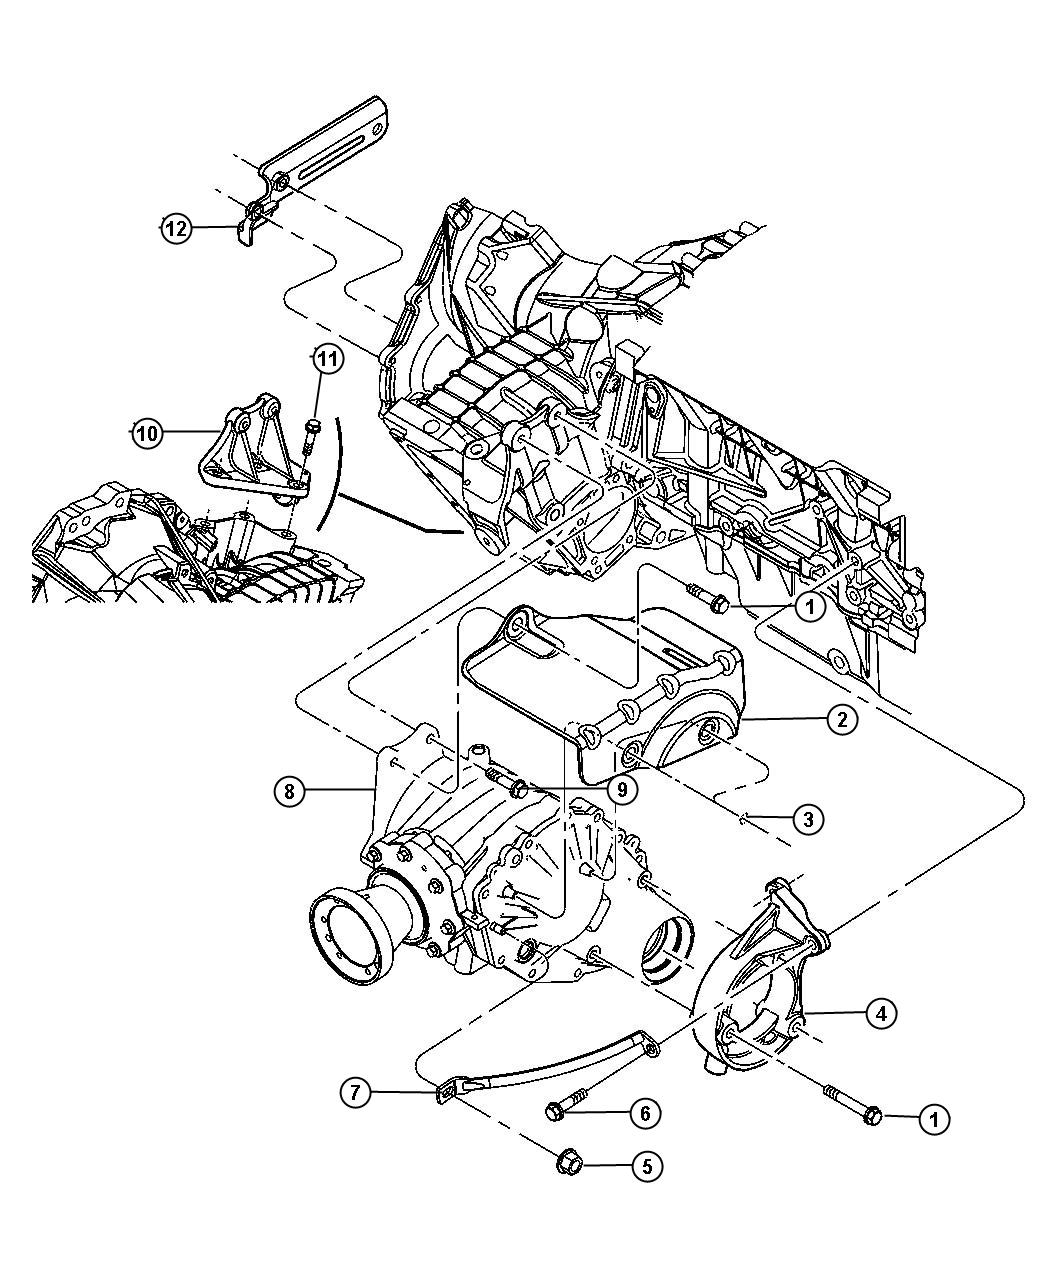 Chrysler Pacifica Power Transfer Unit